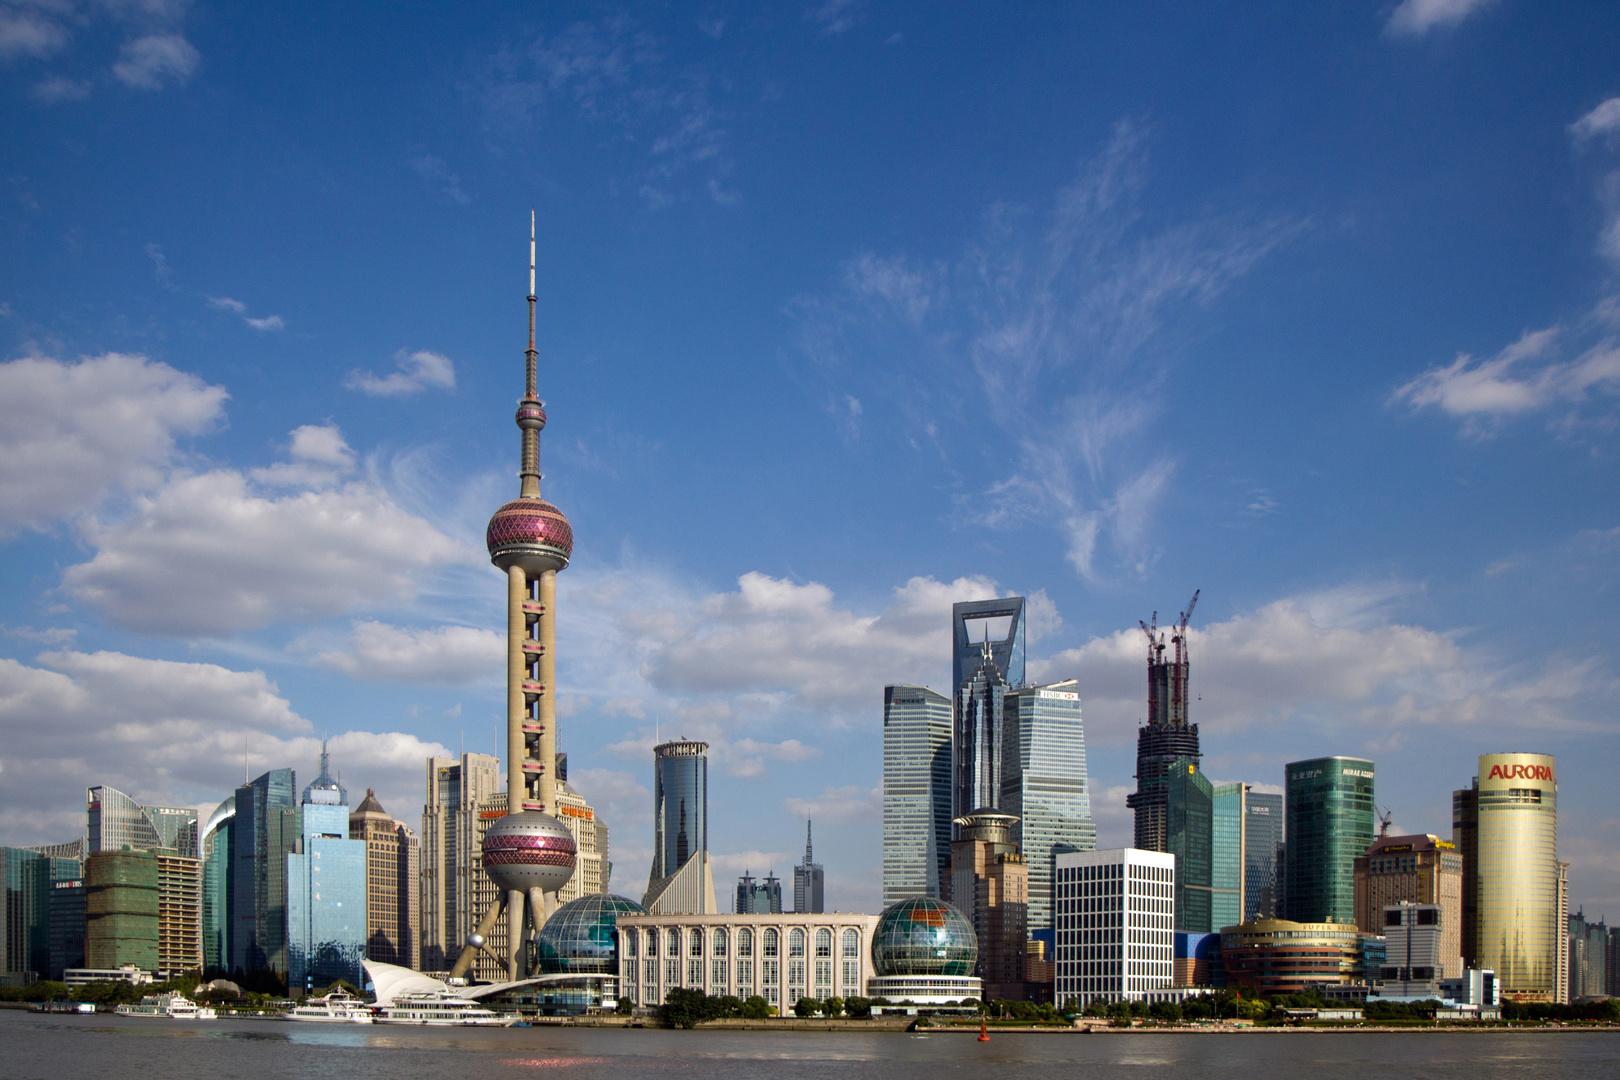 2012_9706 Shanghai Pudong